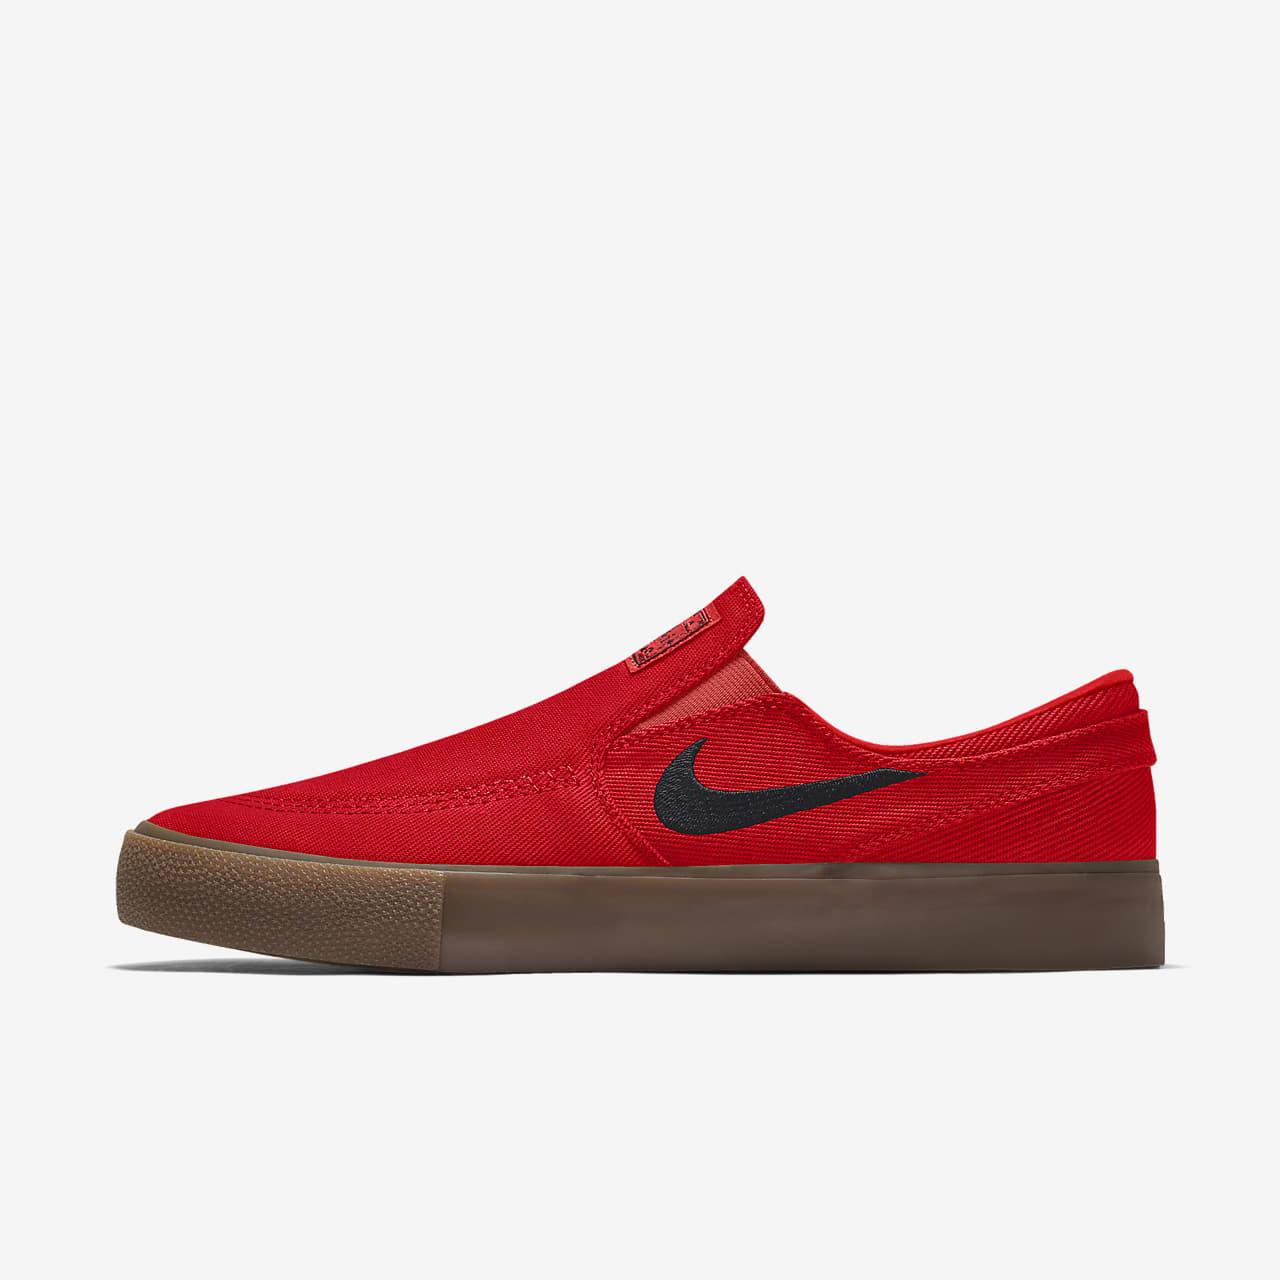 Nike SB Air Zoom Janoski RM By You 男子滑板鞋